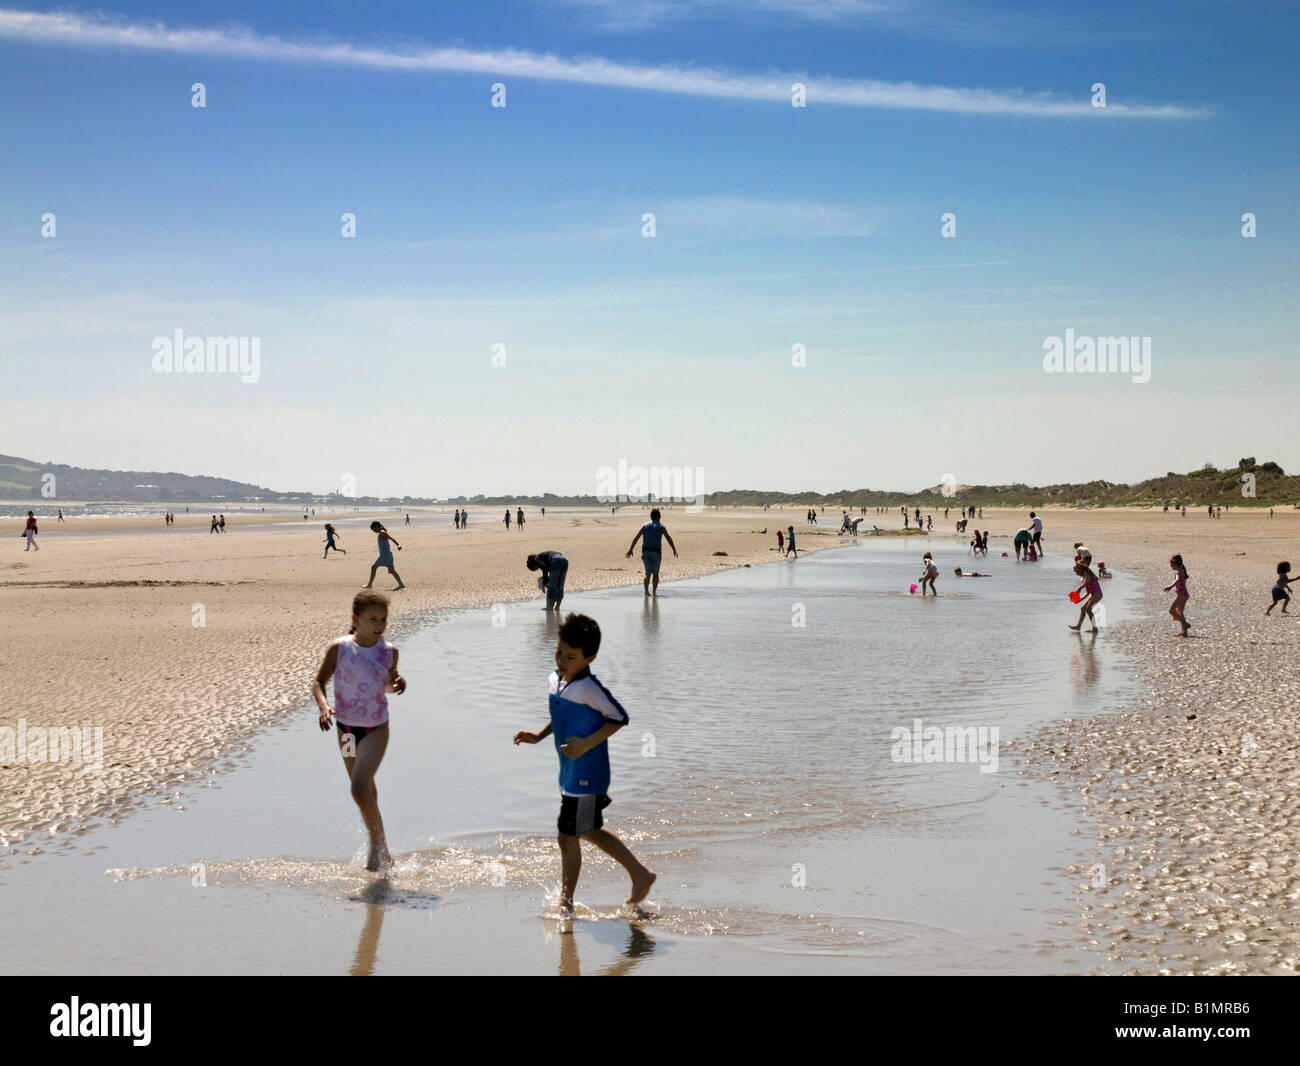 Malahide Beach | | UPDATED June 2020 Top Tips Before You